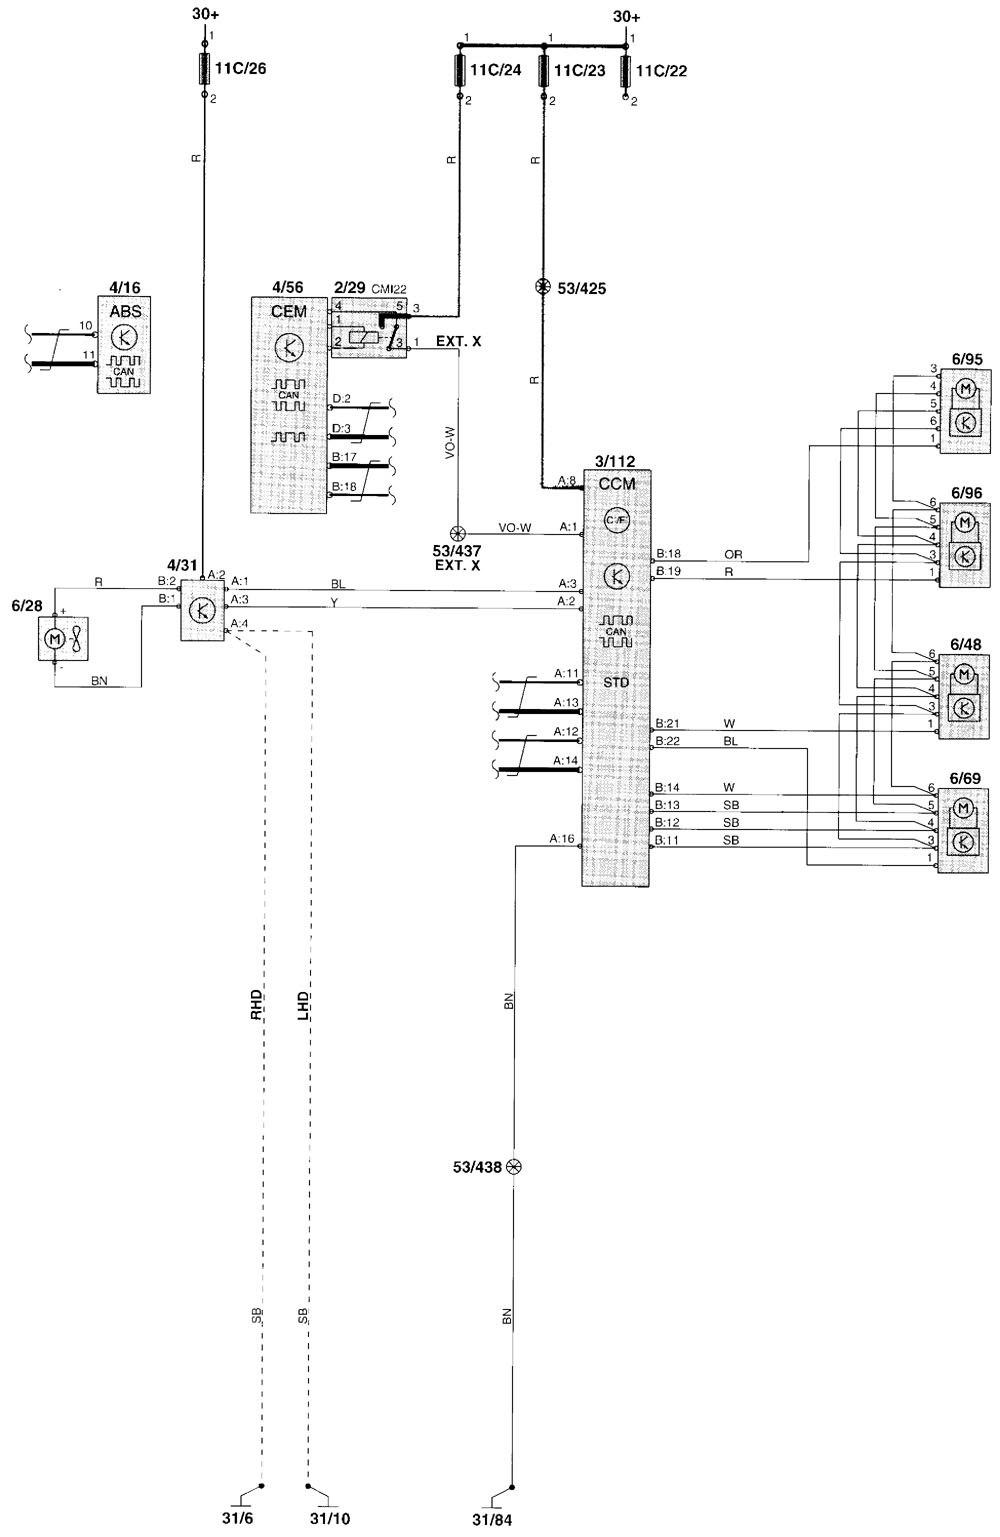 medium resolution of volvo v70 wiring diagram hvac controls part 1